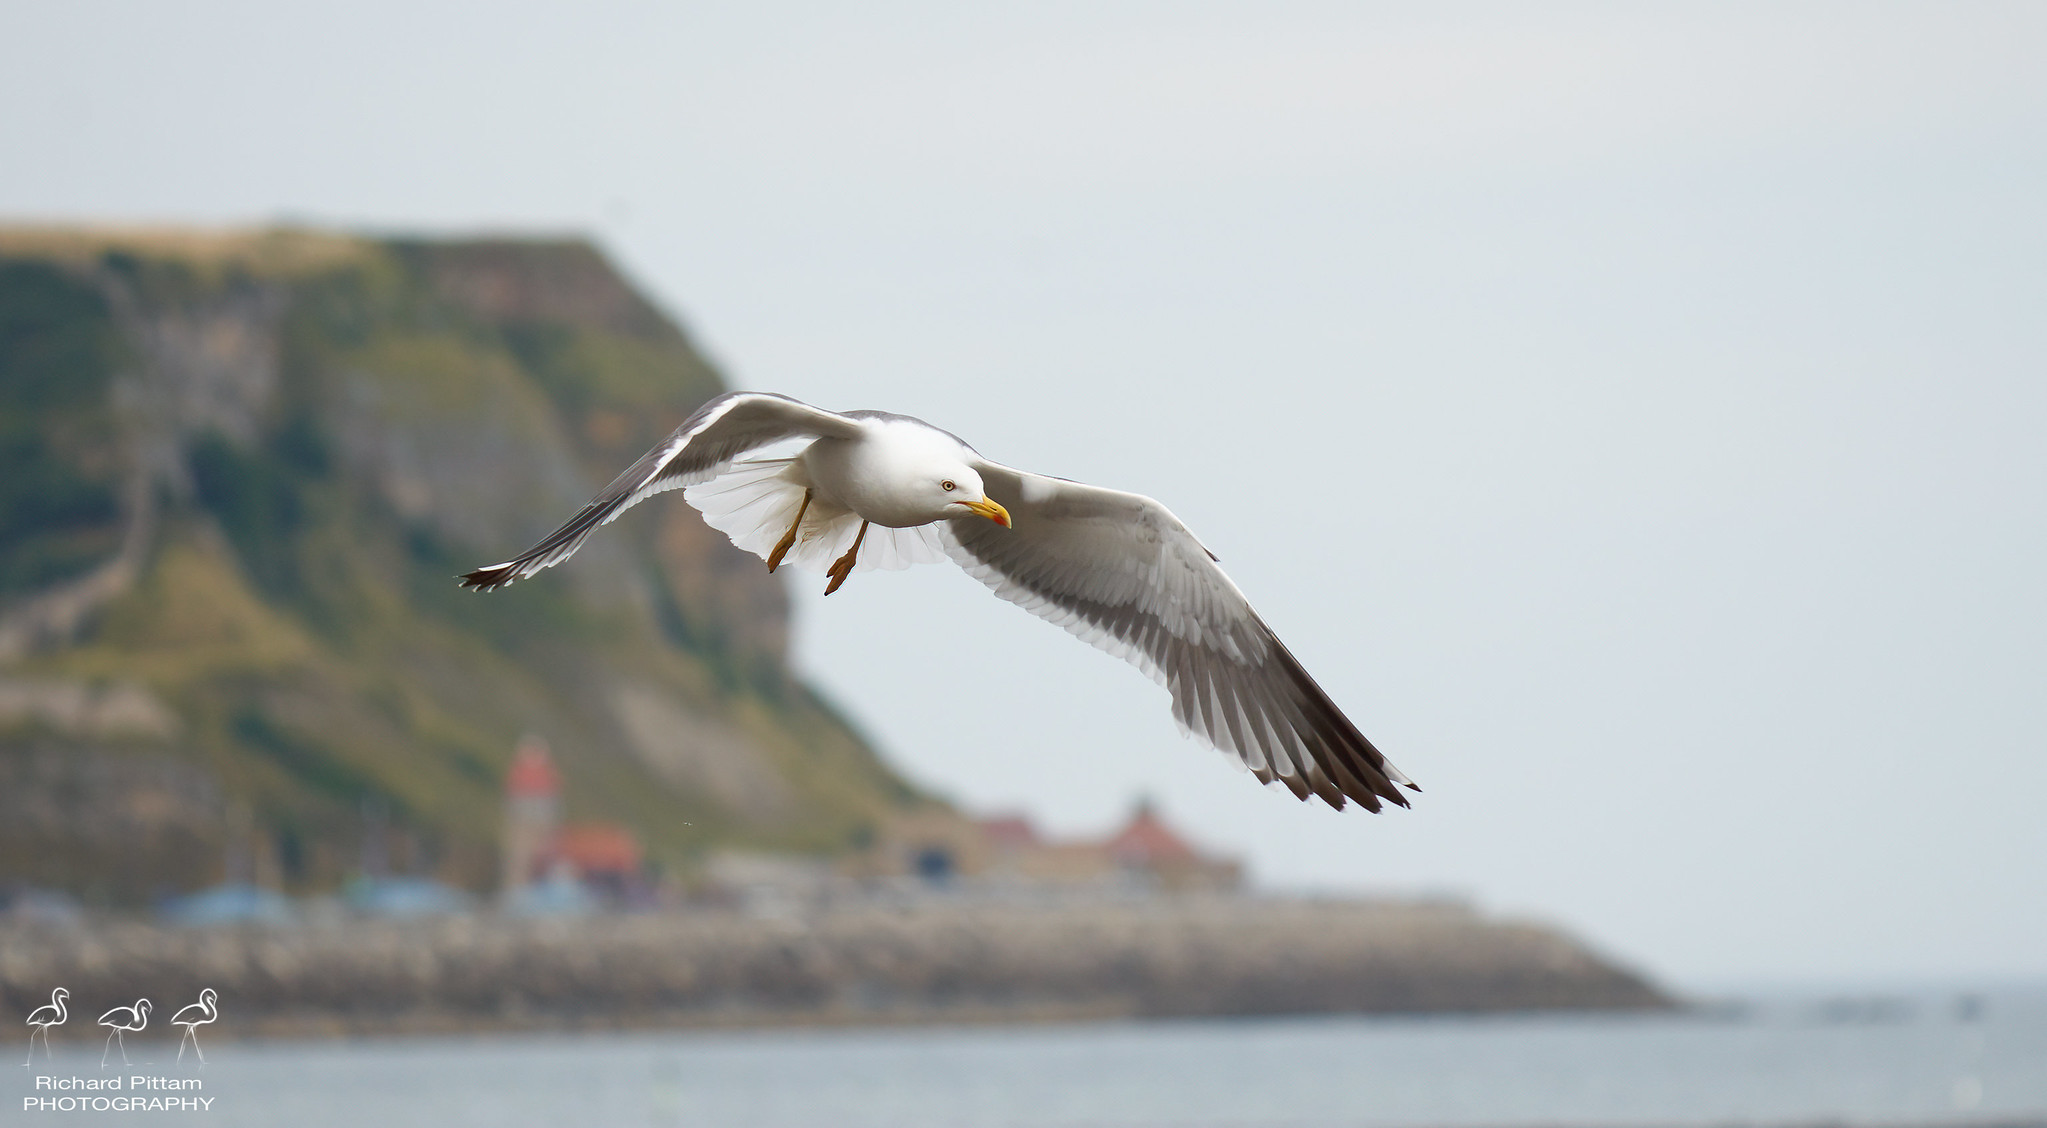 Lesser Black-backed Gull - Scarboropugh headland in background